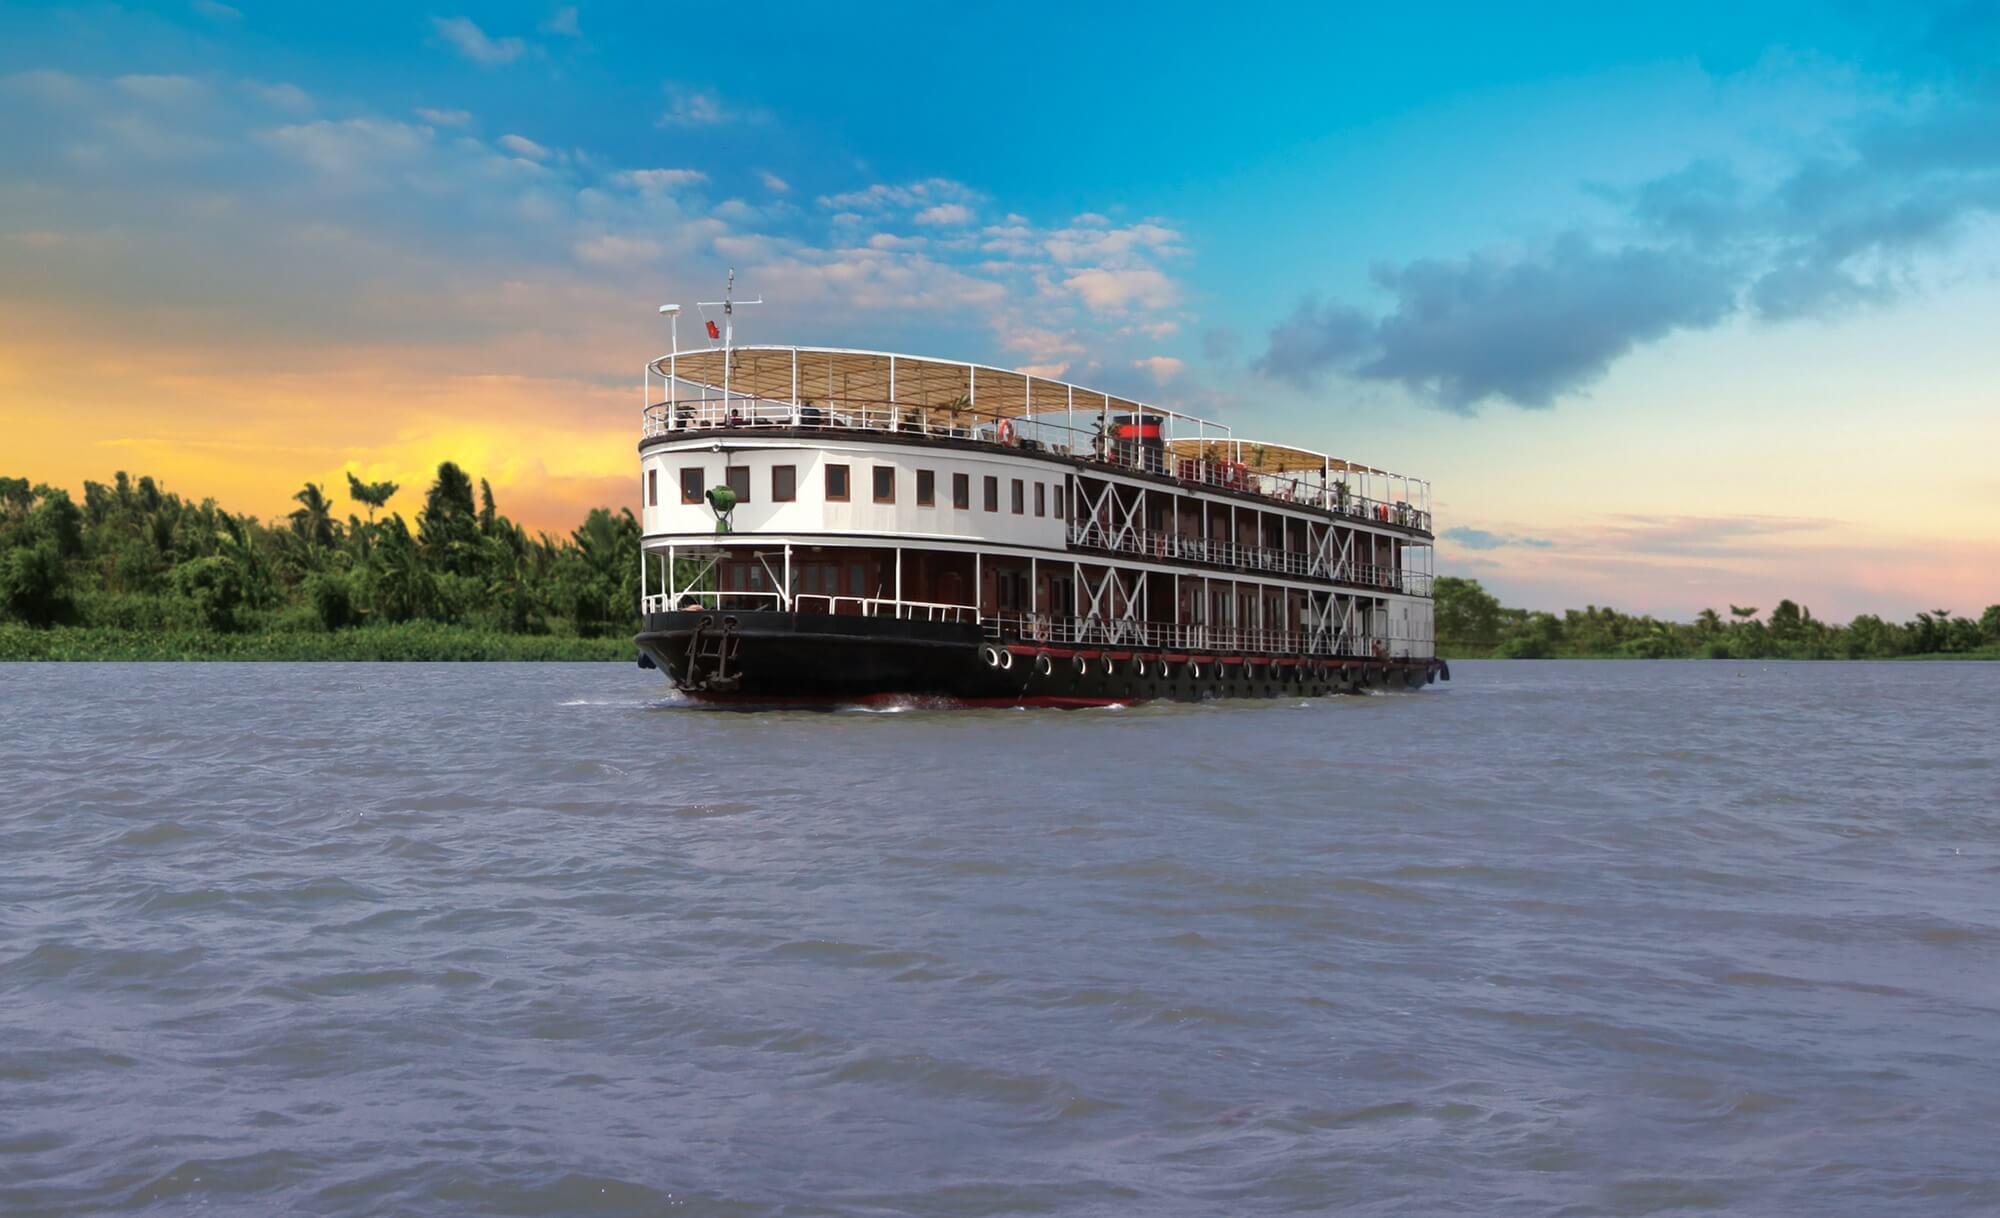 Rv Mekong Pandaw Cruise On Mekong River Sale Up To 10